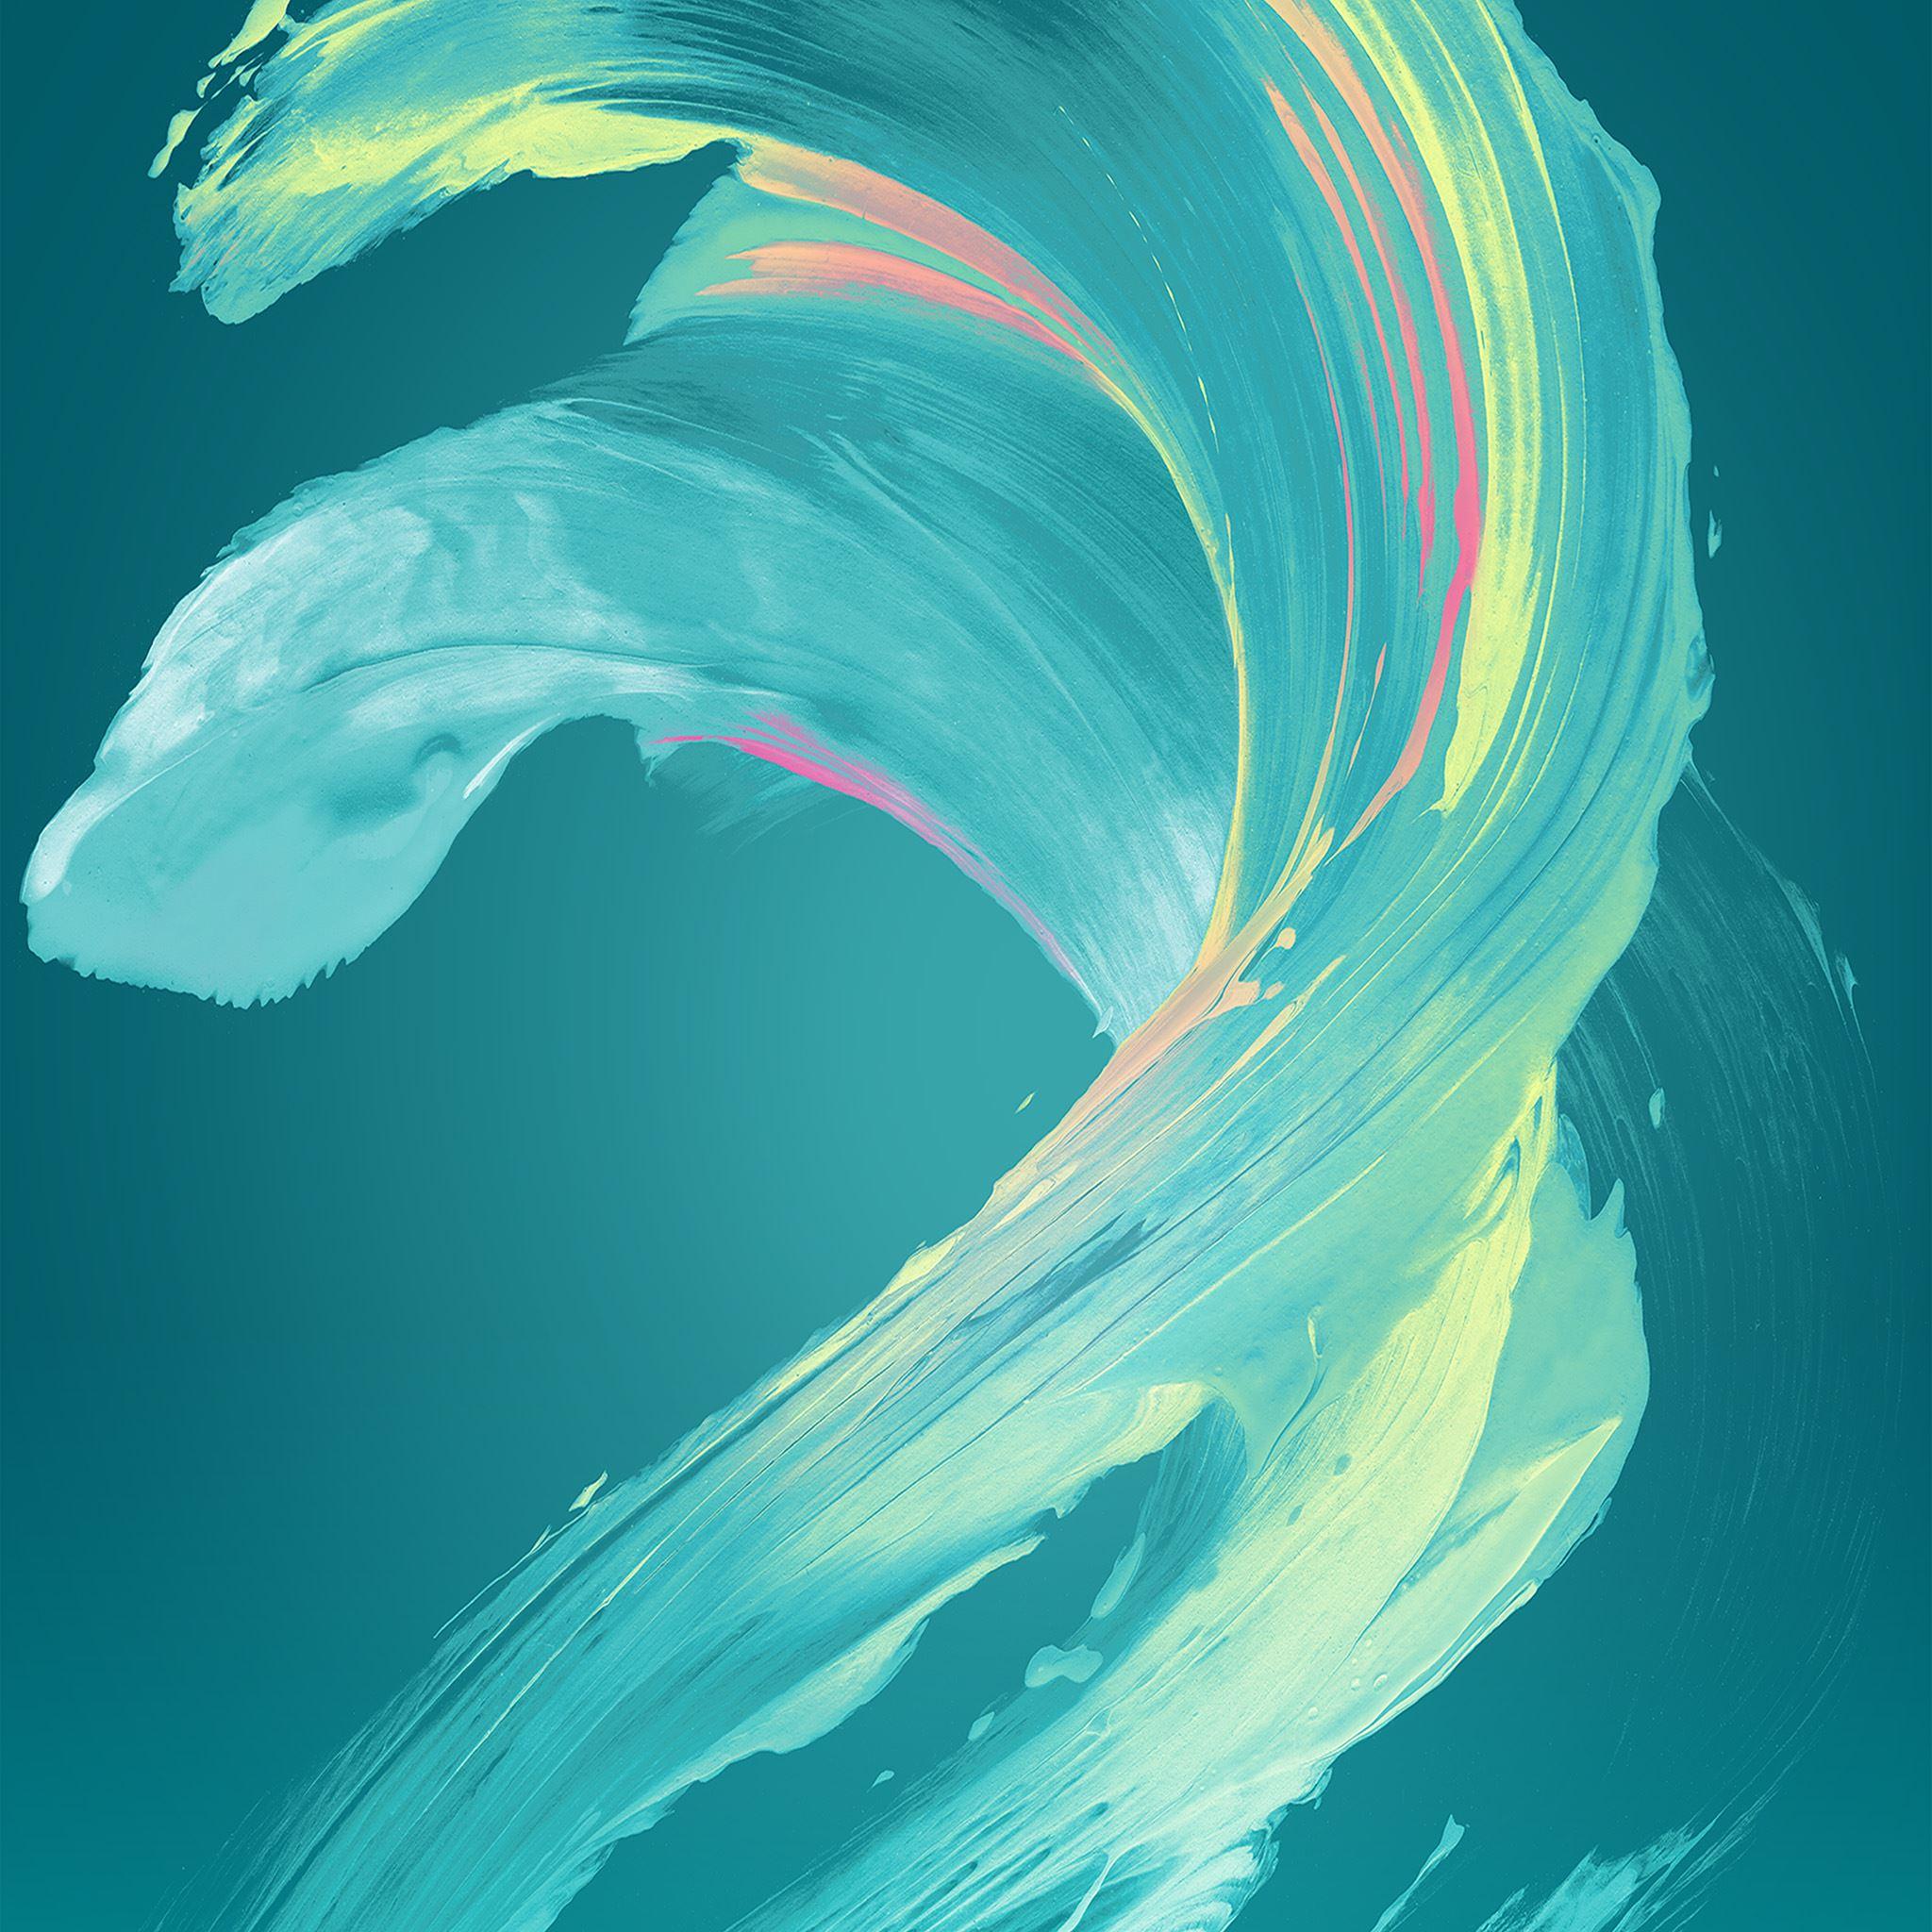 Paint Blue Art Xperia Pattern iPad Air wallpaper